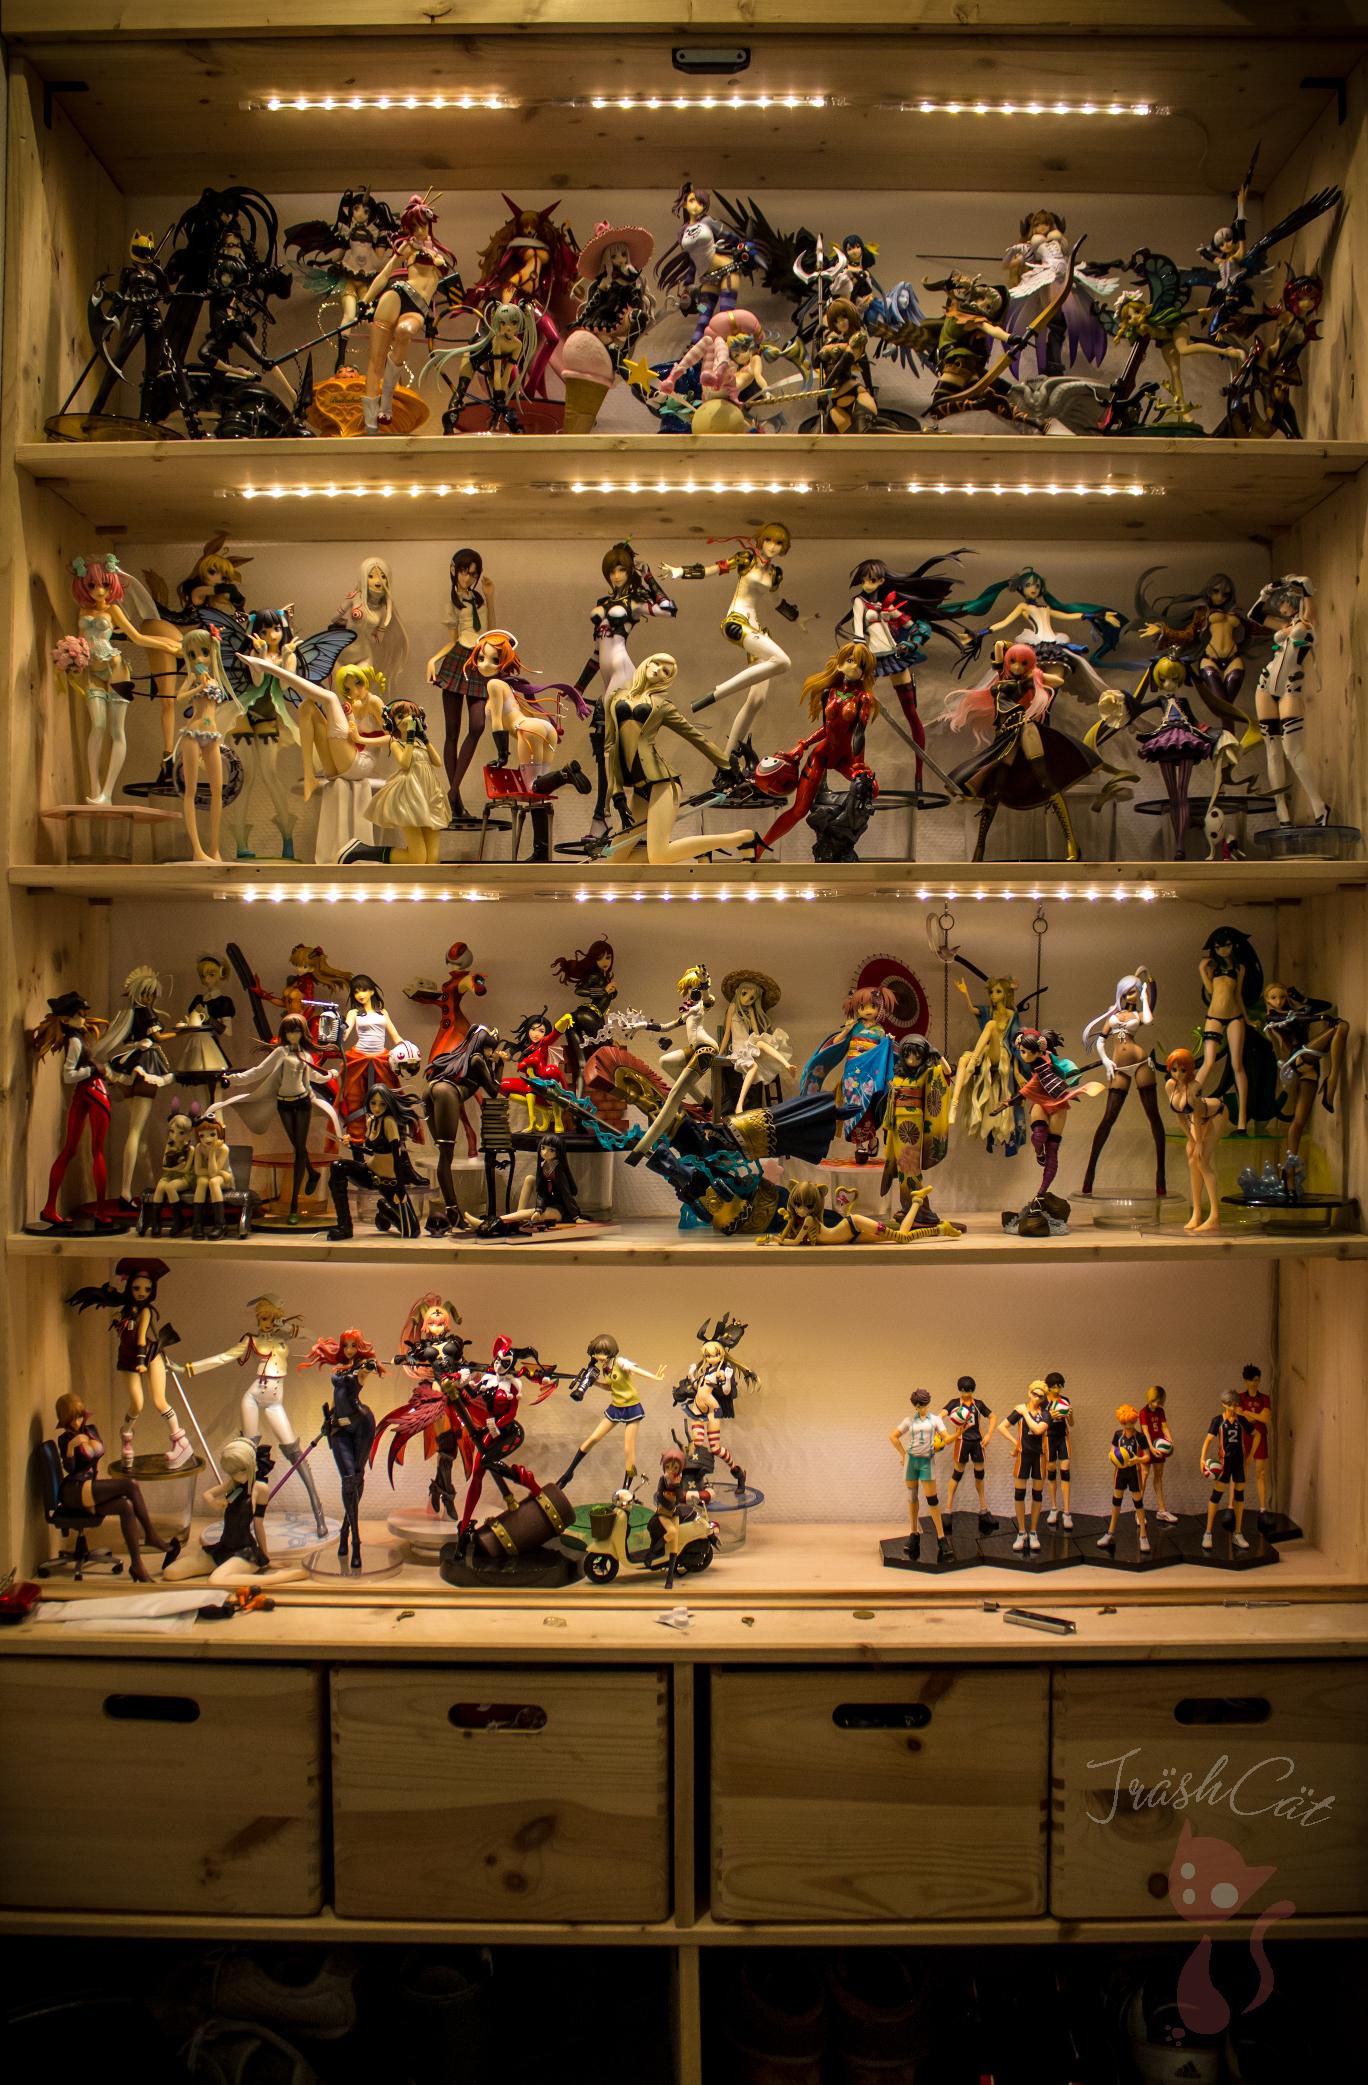 limited vocaloid gainax kotobukiya megahouse limited_edition yamato tony_taka huke atlus one_piece megurine_luka alter max_factory momohime good_smile_company gwendolyn nami hyakka_ryouran hobby_japan excellent_model mercedes star_wars odin_sphere orchid_seed yuma ayanami_rei aisaka_taiga aegis batman sanada_yukimura jigoku_shoujo dc_comics dead_master toradora! x-men souryuu_asuka_langley yoko_littner lancer zegapain fukumoto_noritaka oboro_muramasa murata_range cospa hattori_kiriko chieri yamashita_shunya ascii_media_works original_character ques_q evangelion_shin_gekijouban saitou_fumiki hagii_shunji dizzy yagyuu_toshiyuki black_★_rock_shooter kawanishi_ken ajiken inagaki_hiroshi sif_ex guilty_gear_xx_Λ_core marvel_x_bishoujo alpha_x_omega crypton_future_media tengen_toppa_gurren-lagann yoshizawa_mitsumasa code_geass_-_hangyaku_no_lelouch moon_toys enma_ai asano_yuuji amiami_zero uchijima_yasuhiro shin_megami_tensei:_persona_3 kaminagi_ryoko shin_megami_tensei:_persona_3_fes enka_oudo_dai_shogun red_stone mirei-san e-animedia mazaki_yuusuke ozawa_shingo villetta_nu reflect ex_resinya! harley_quinn katsuaki_nemoto no_more_heroes_2:_desperate_struggle sylvia_kristel kawagoe_hiromitsu kozaki_yusuke x-23 bishoujo_statue portrait_of_pirates_limited_edition creators'_labo soejima_shigenori george_kamitani dc_comics_bishoujo otoyama_houjun marvelous_aql takahashi_masahiro